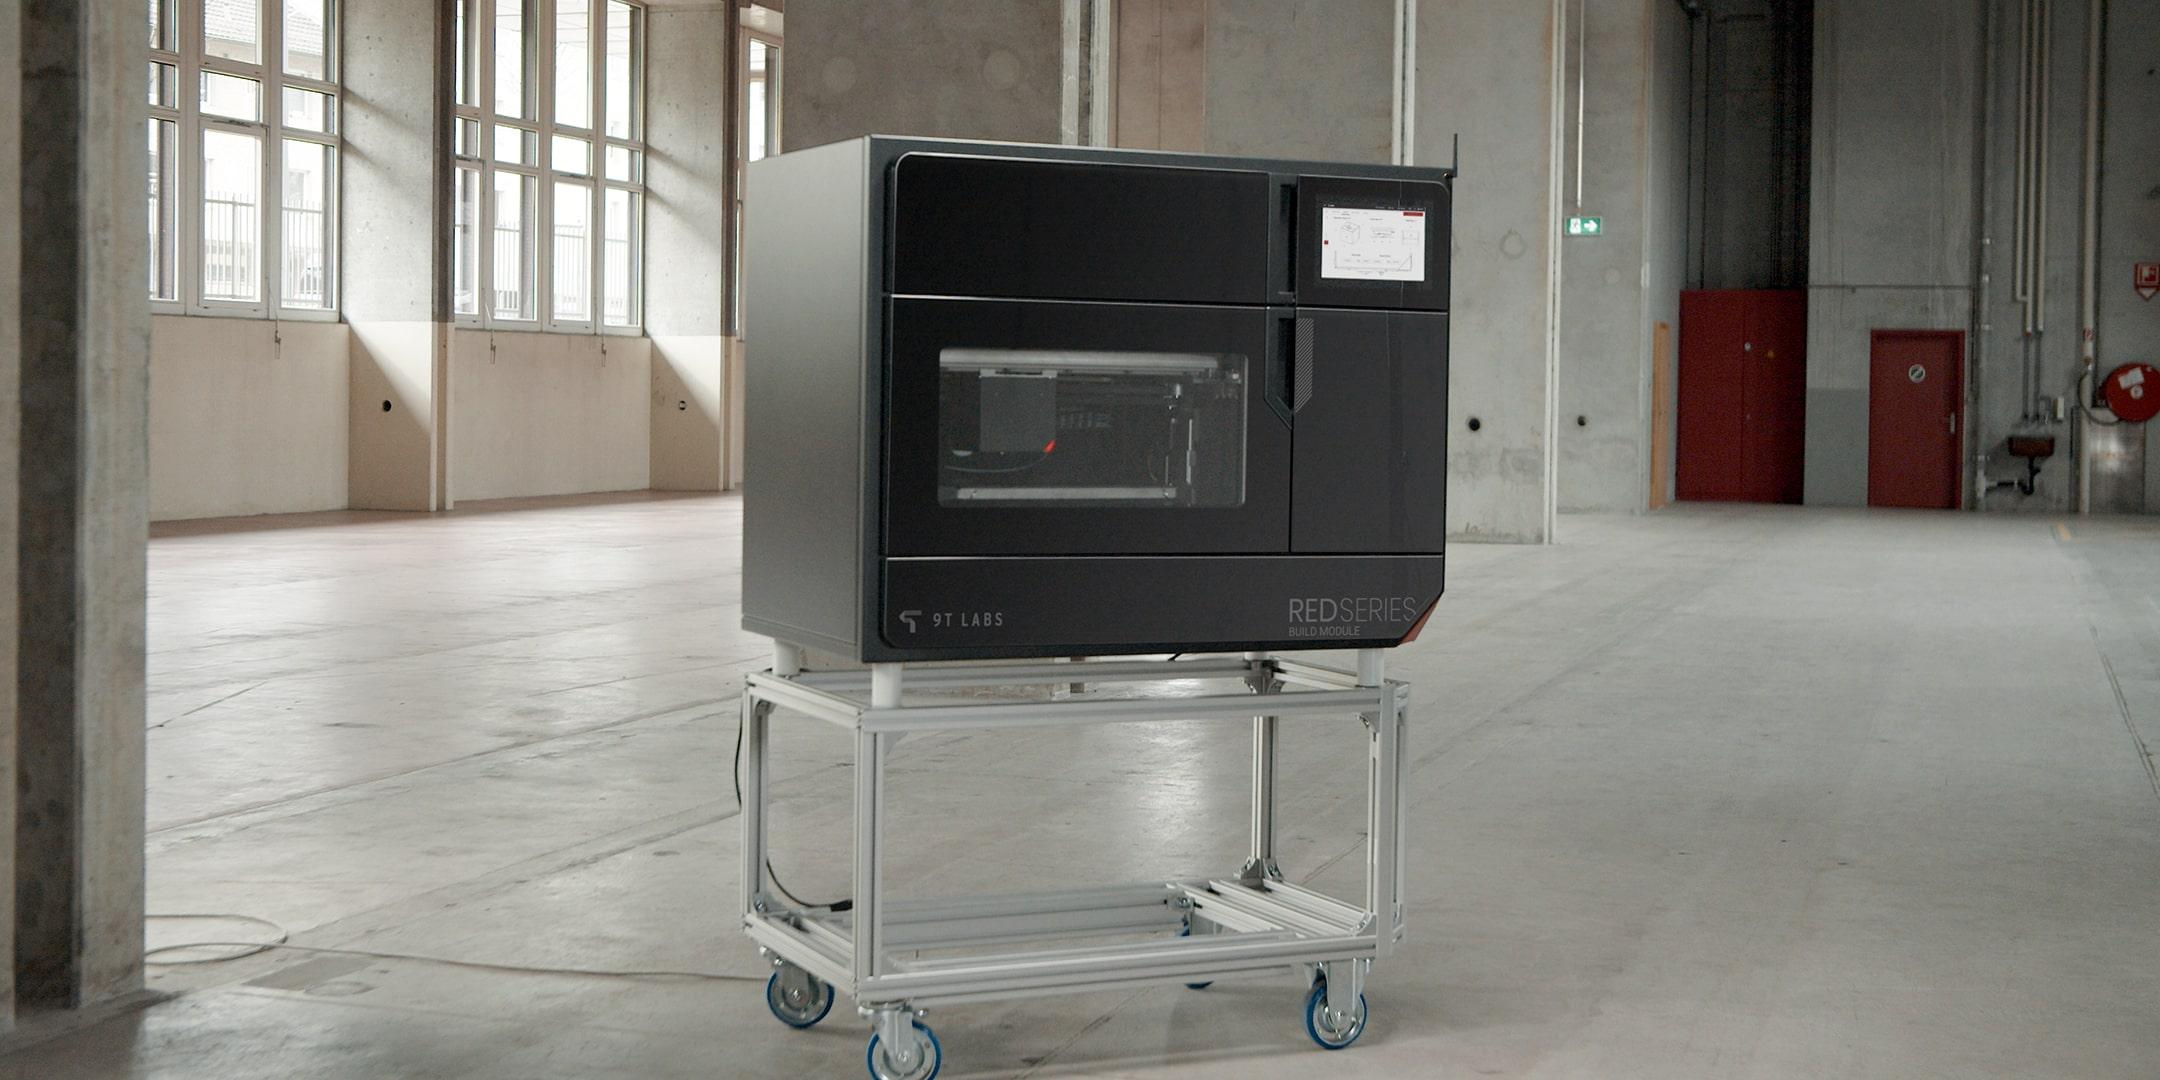 9T Labs build module for 3d printed carbon composites